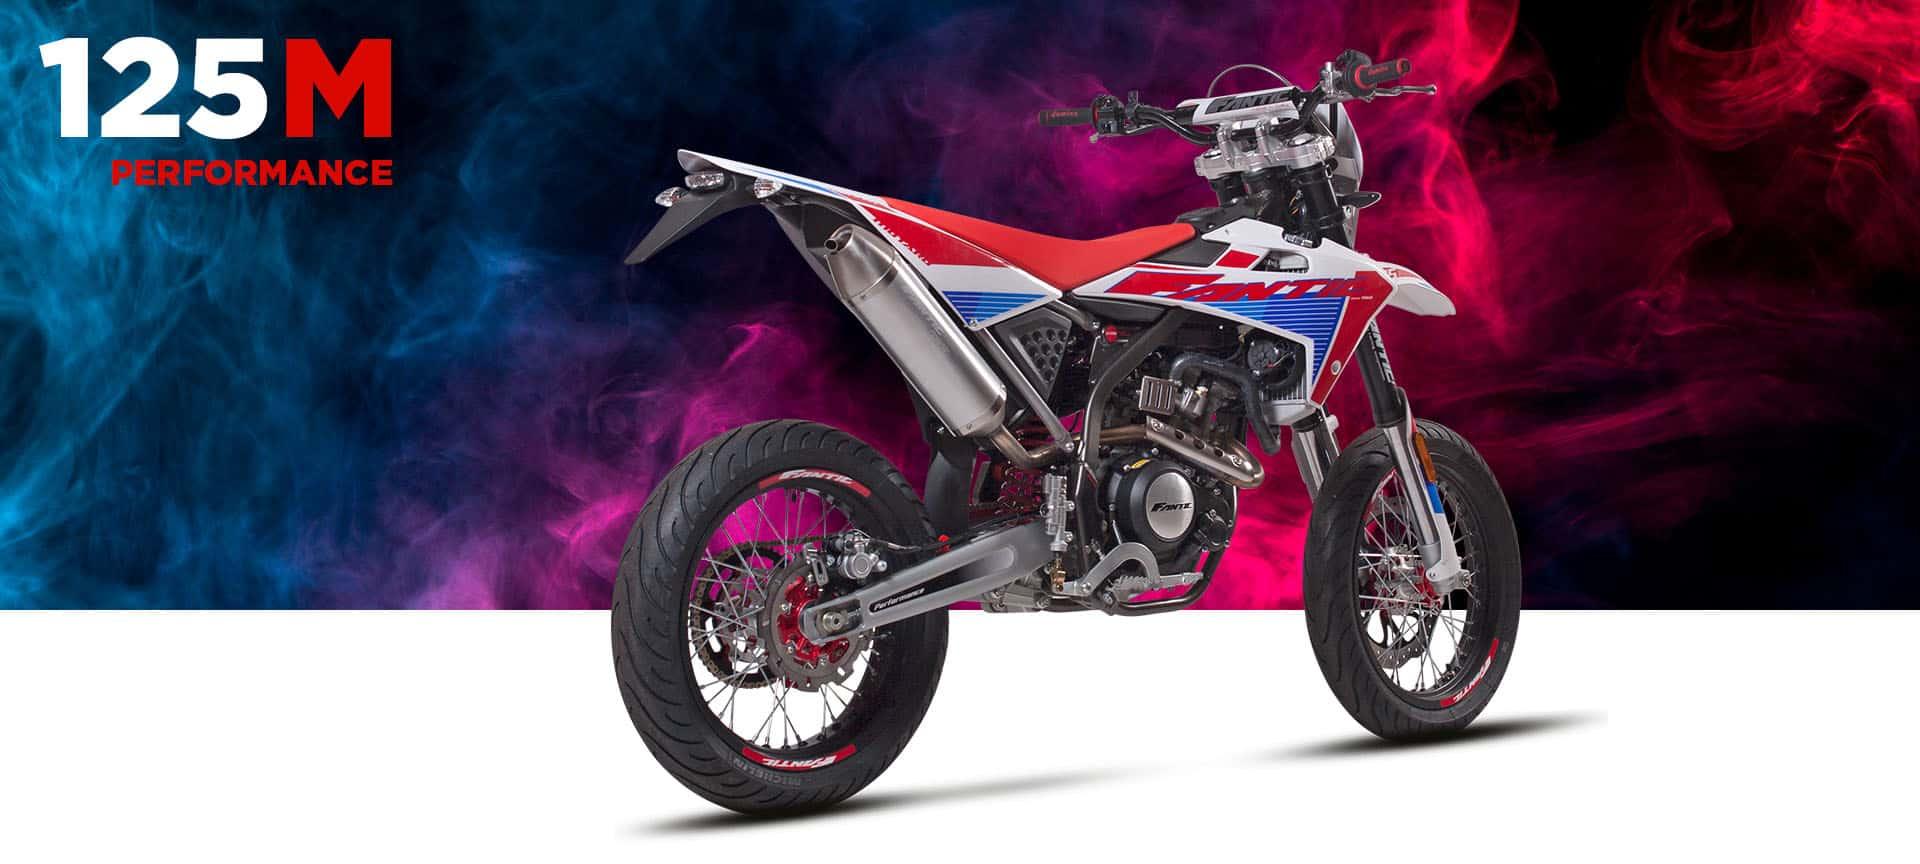 Fantic 125m Performance motorsykkel   Fantic Motor Norge